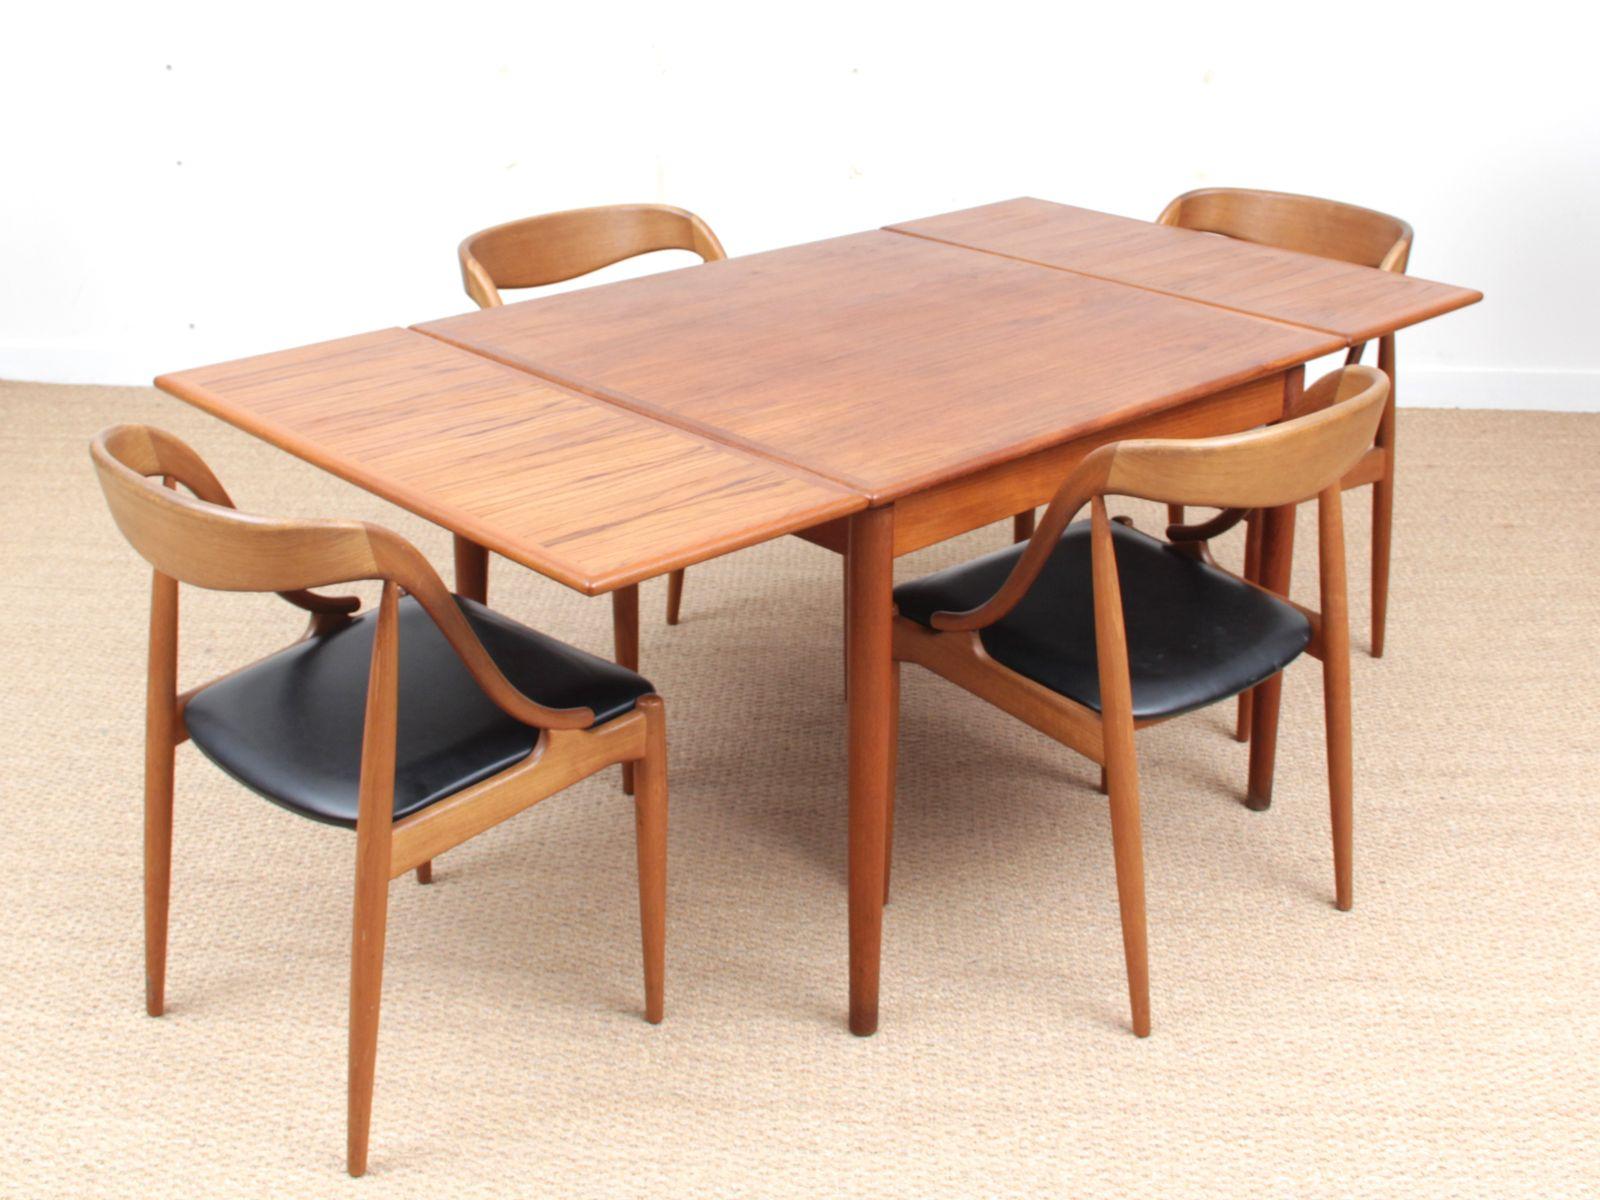 table de salle manger en teck 1960s en vente sur pamono. Black Bedroom Furniture Sets. Home Design Ideas